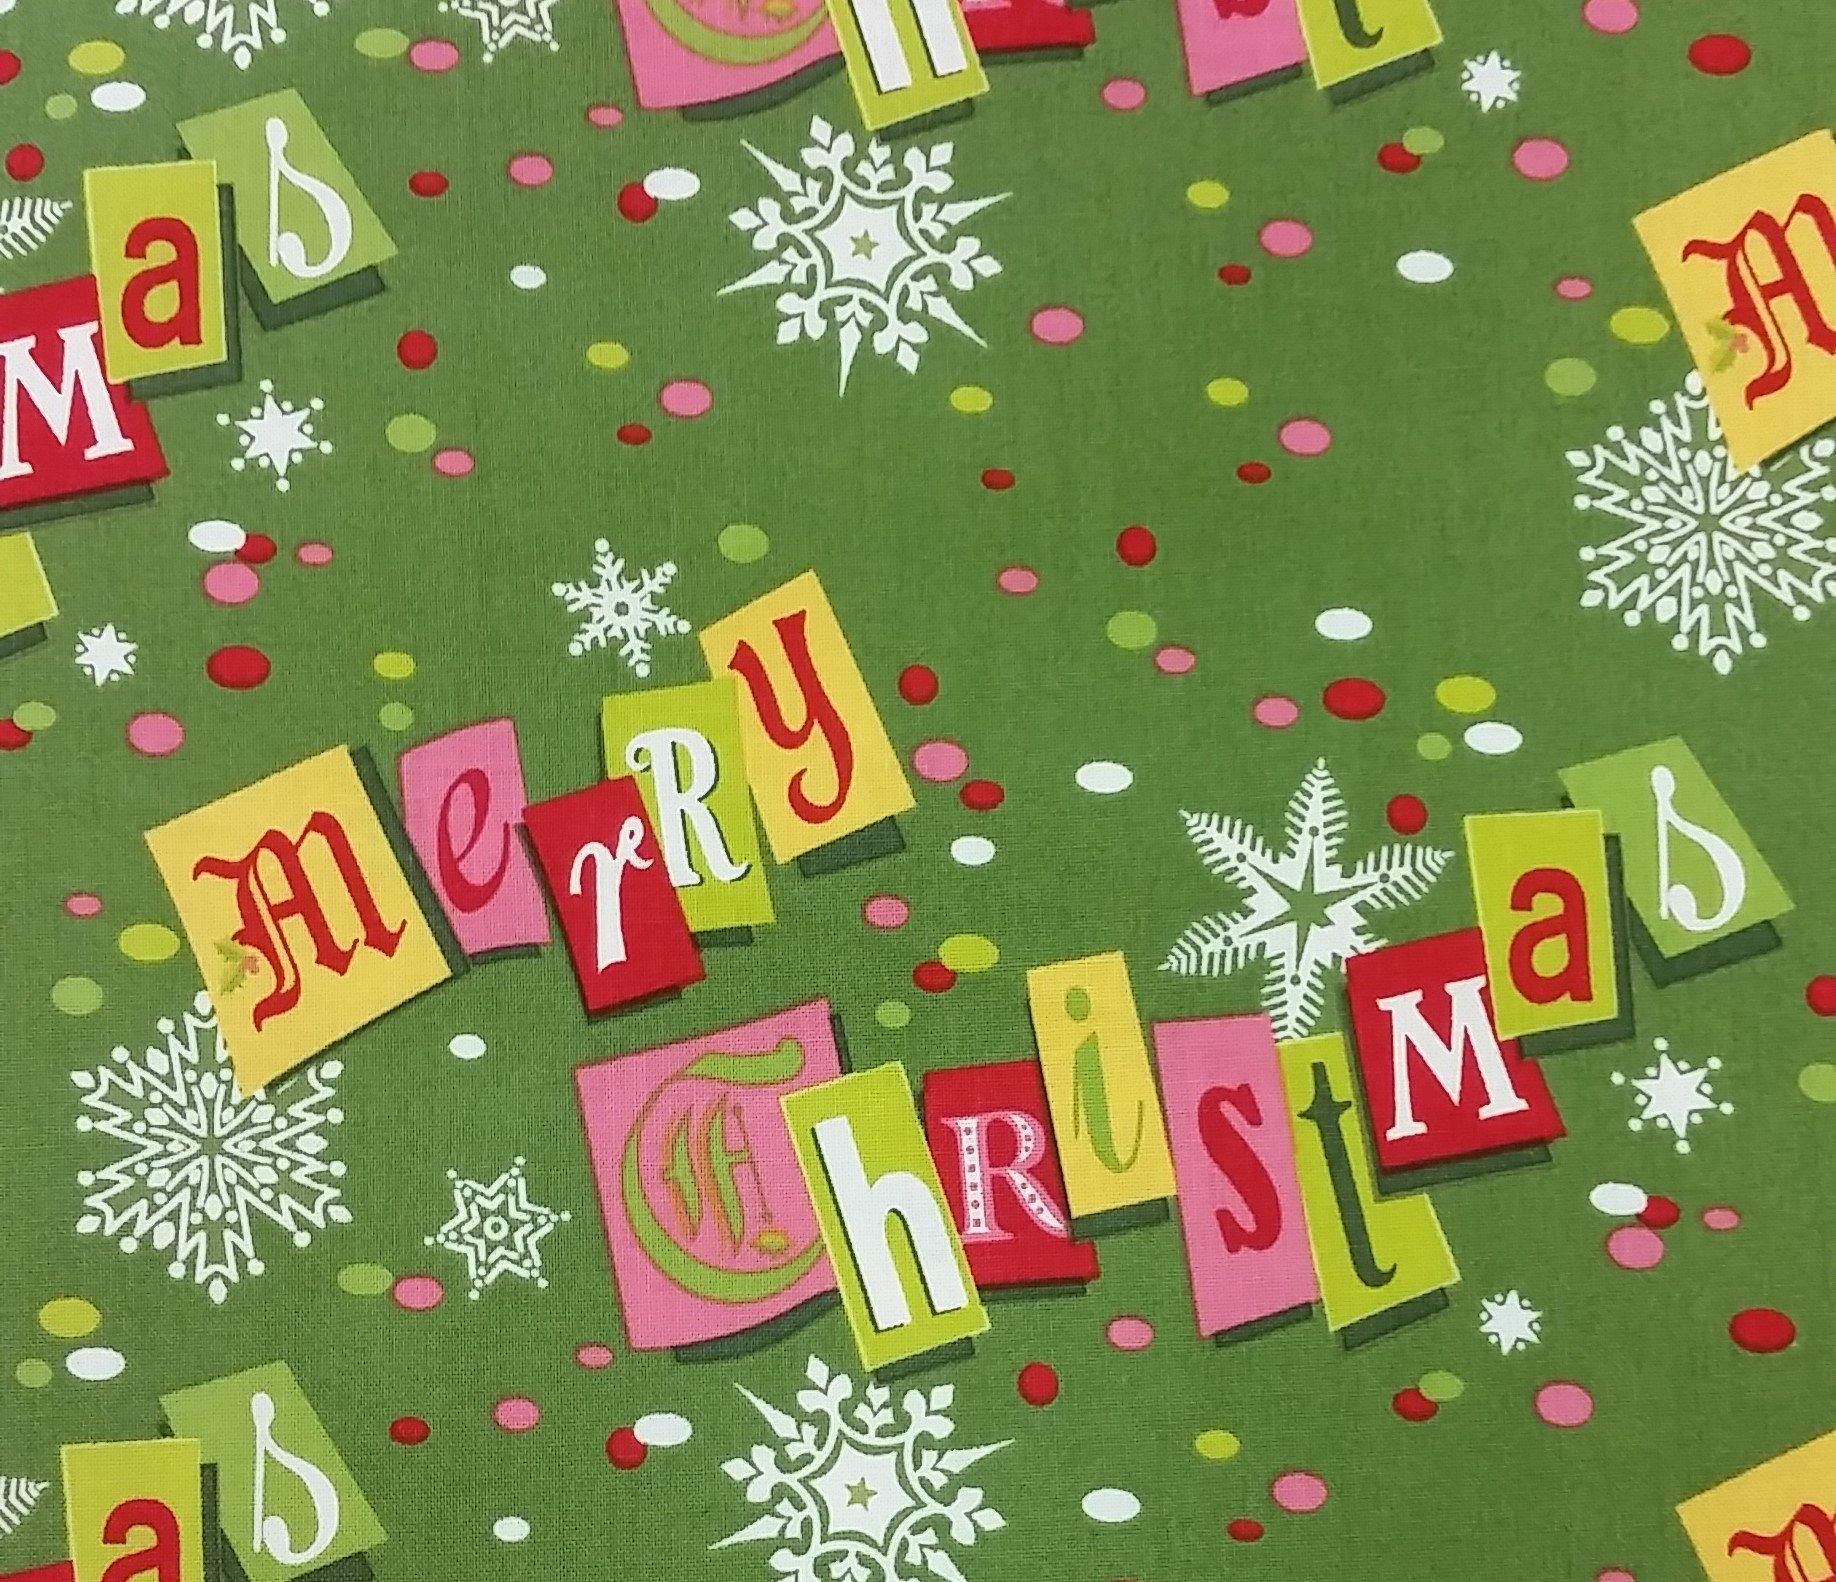 Christmas Kitsch - 05.2